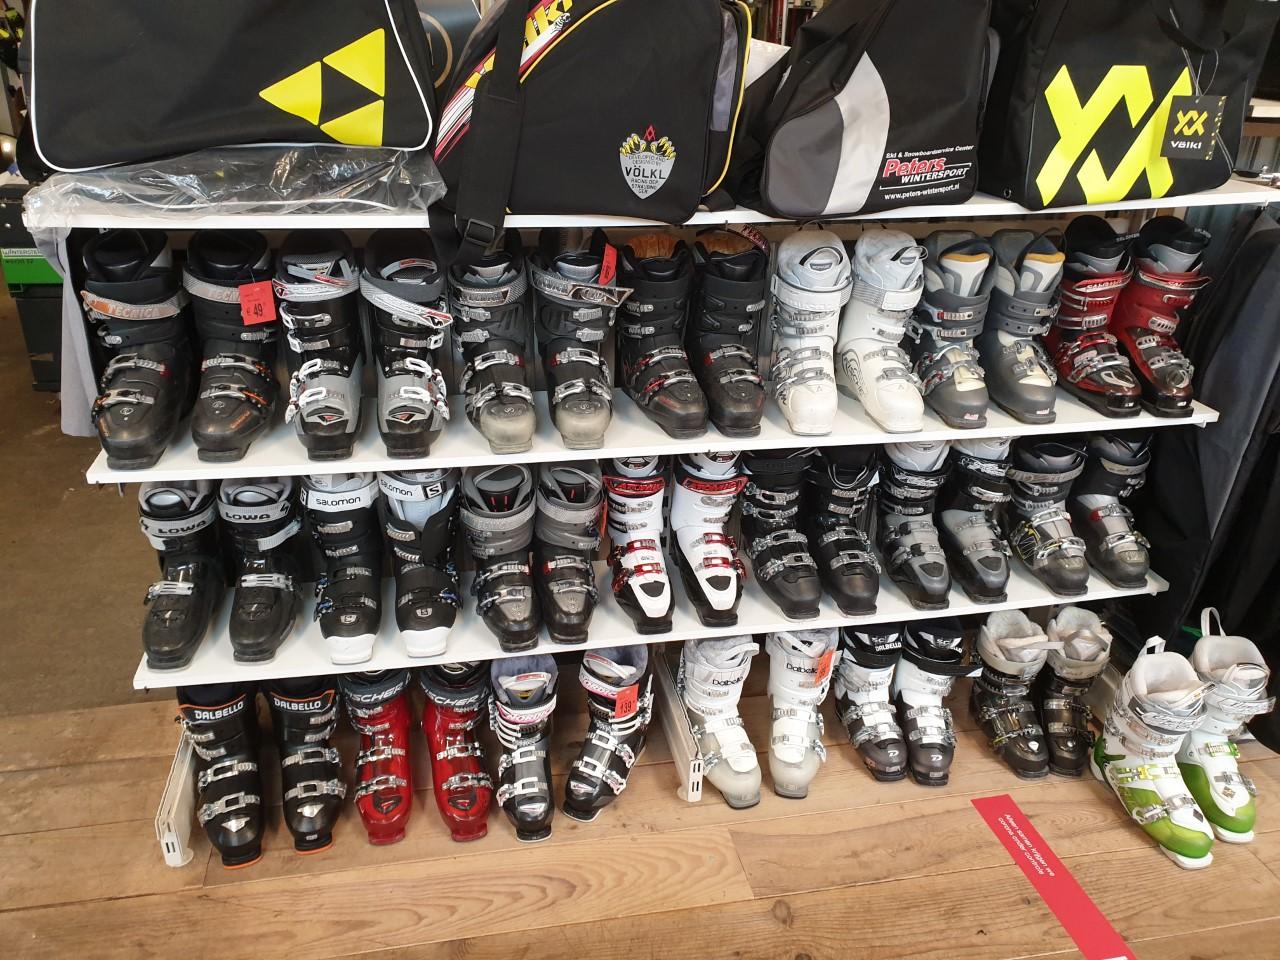 Gebruikte ski/snowboard schoenen